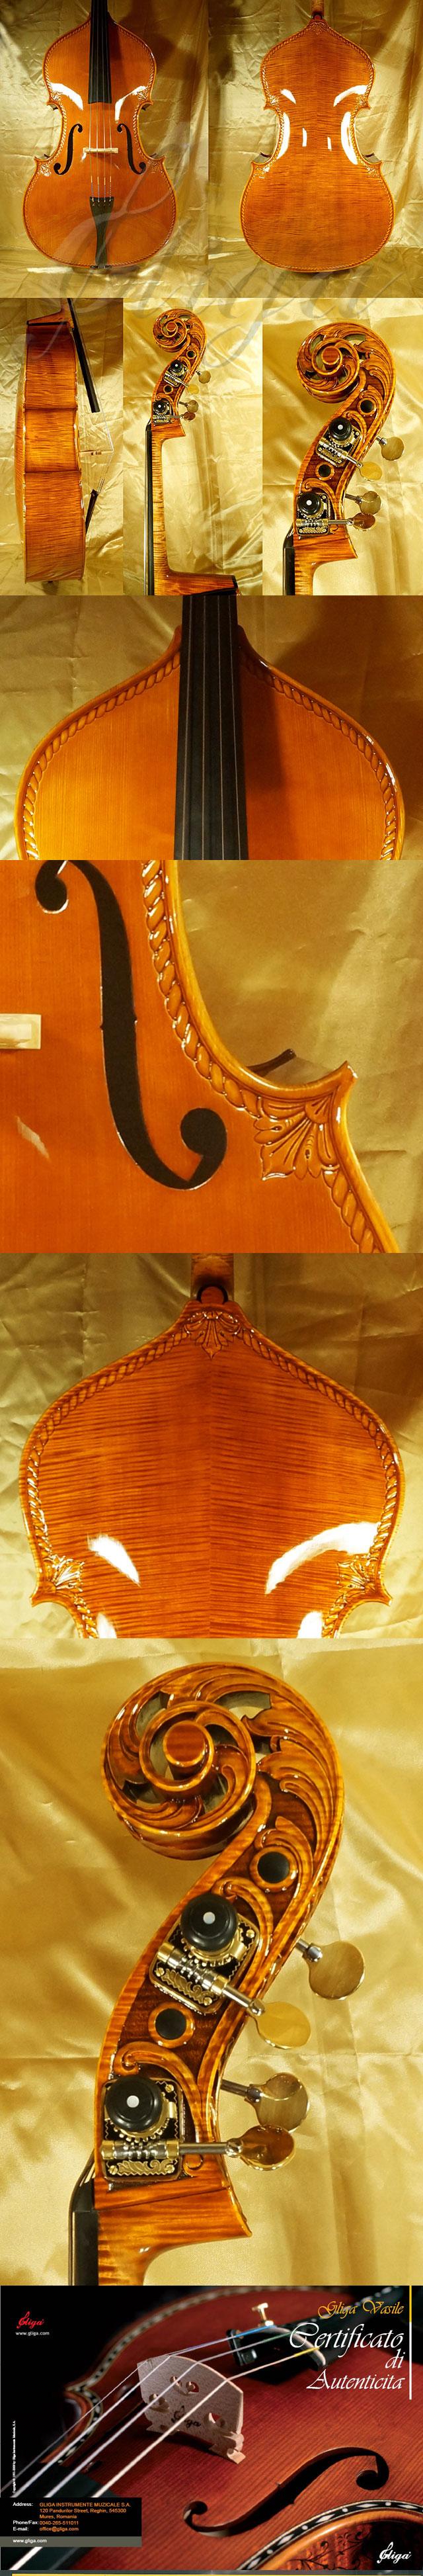 Shiny 3/4 MAESTRO VASILE GLIGA Scroll Double-Bass